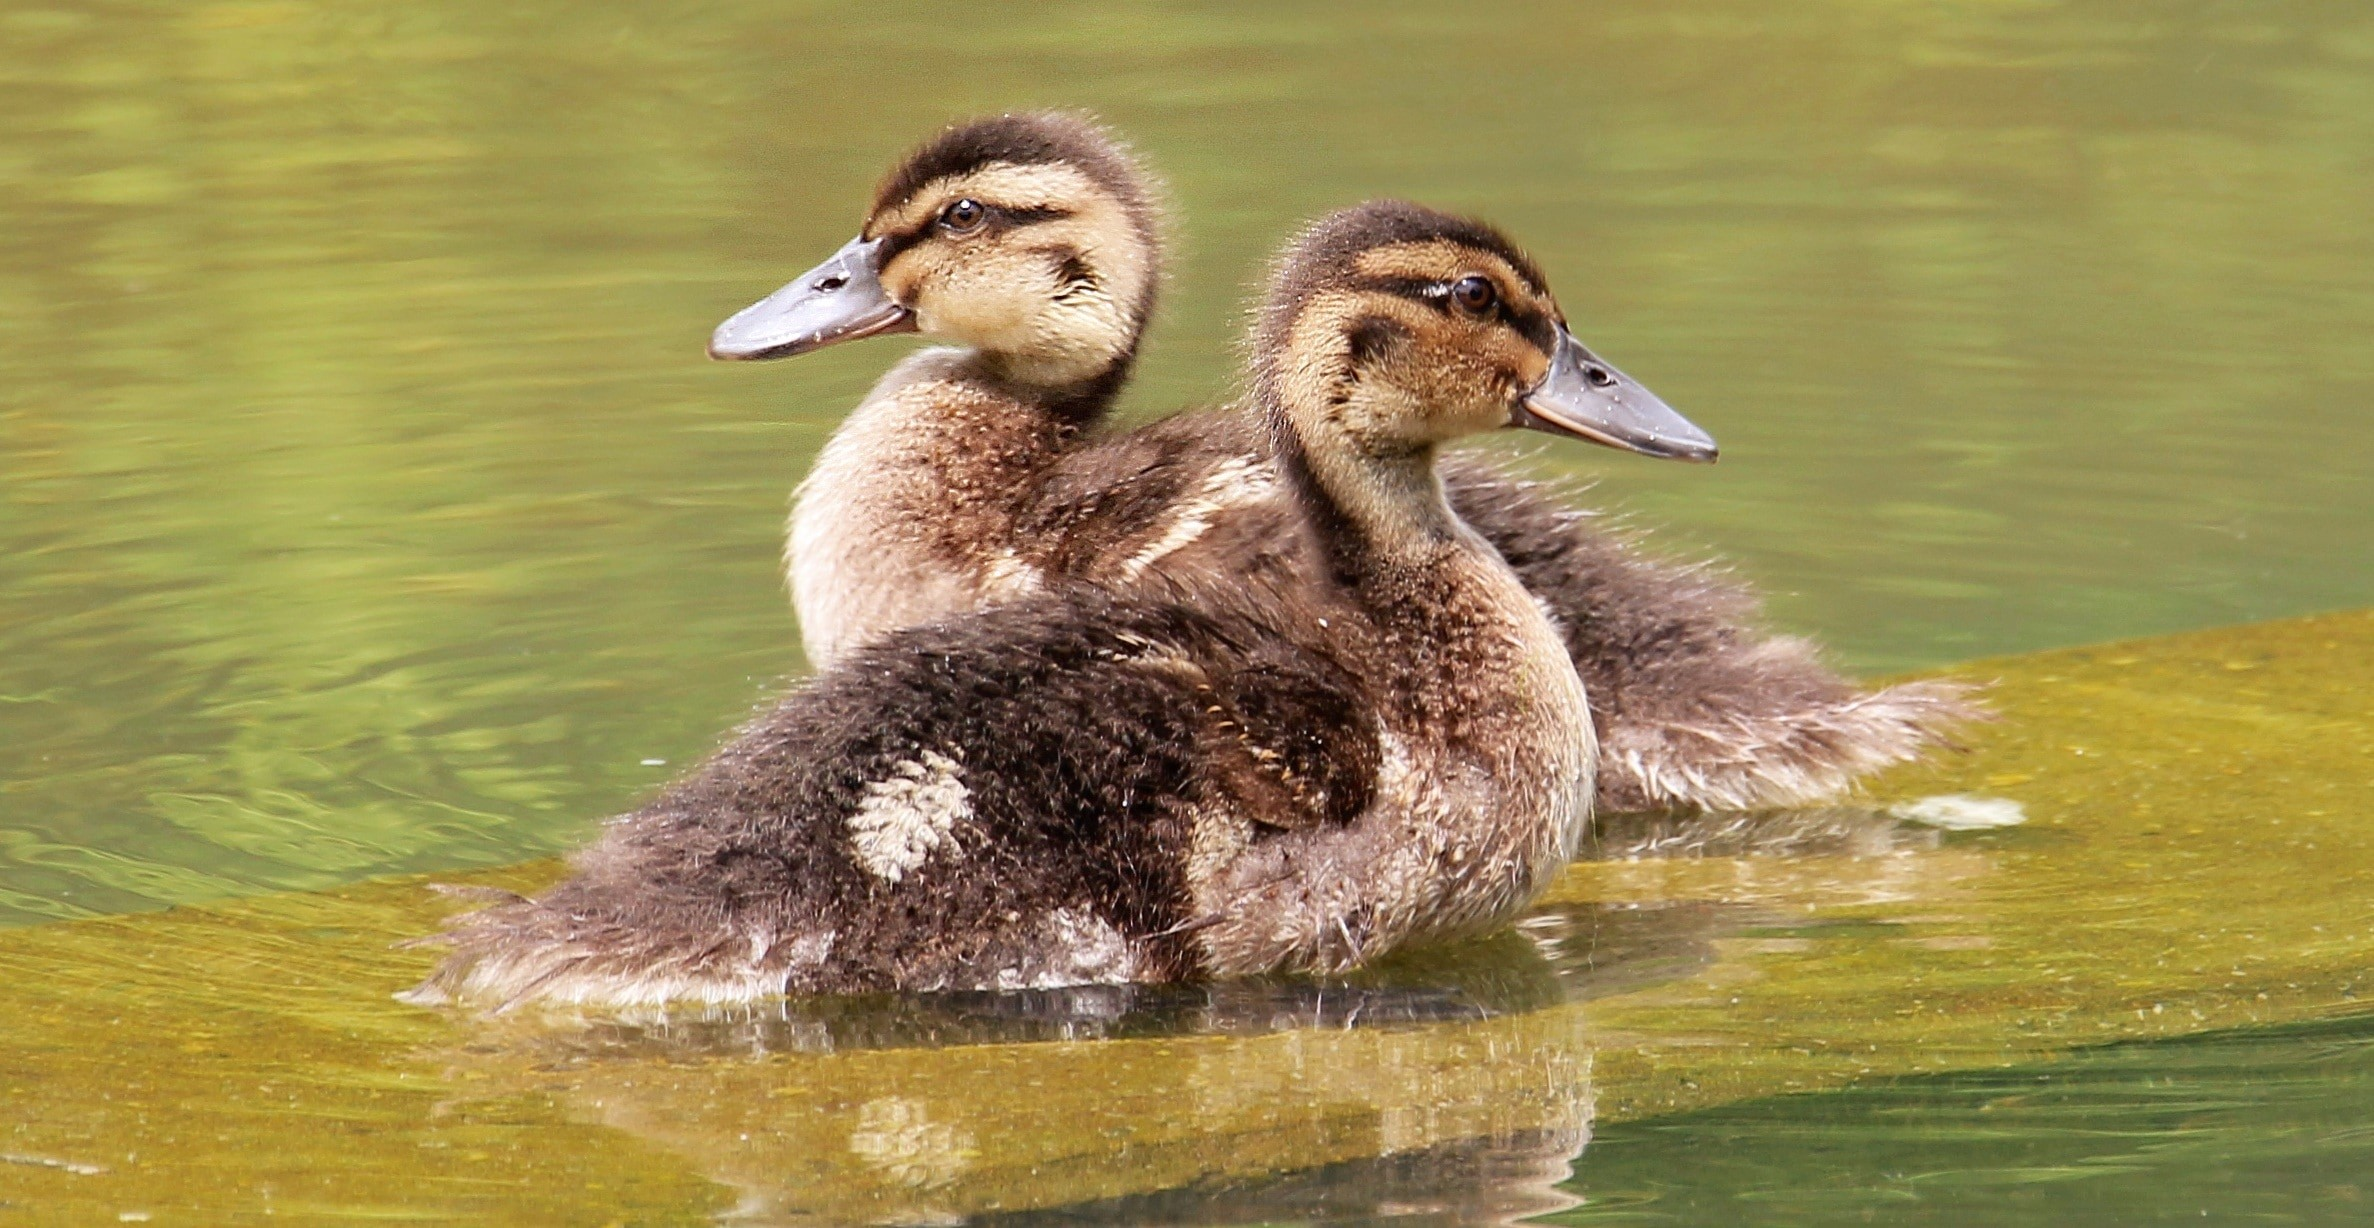 Cute Baby Duck Wallpaper Hd Duckling Wallpaper 68 Images